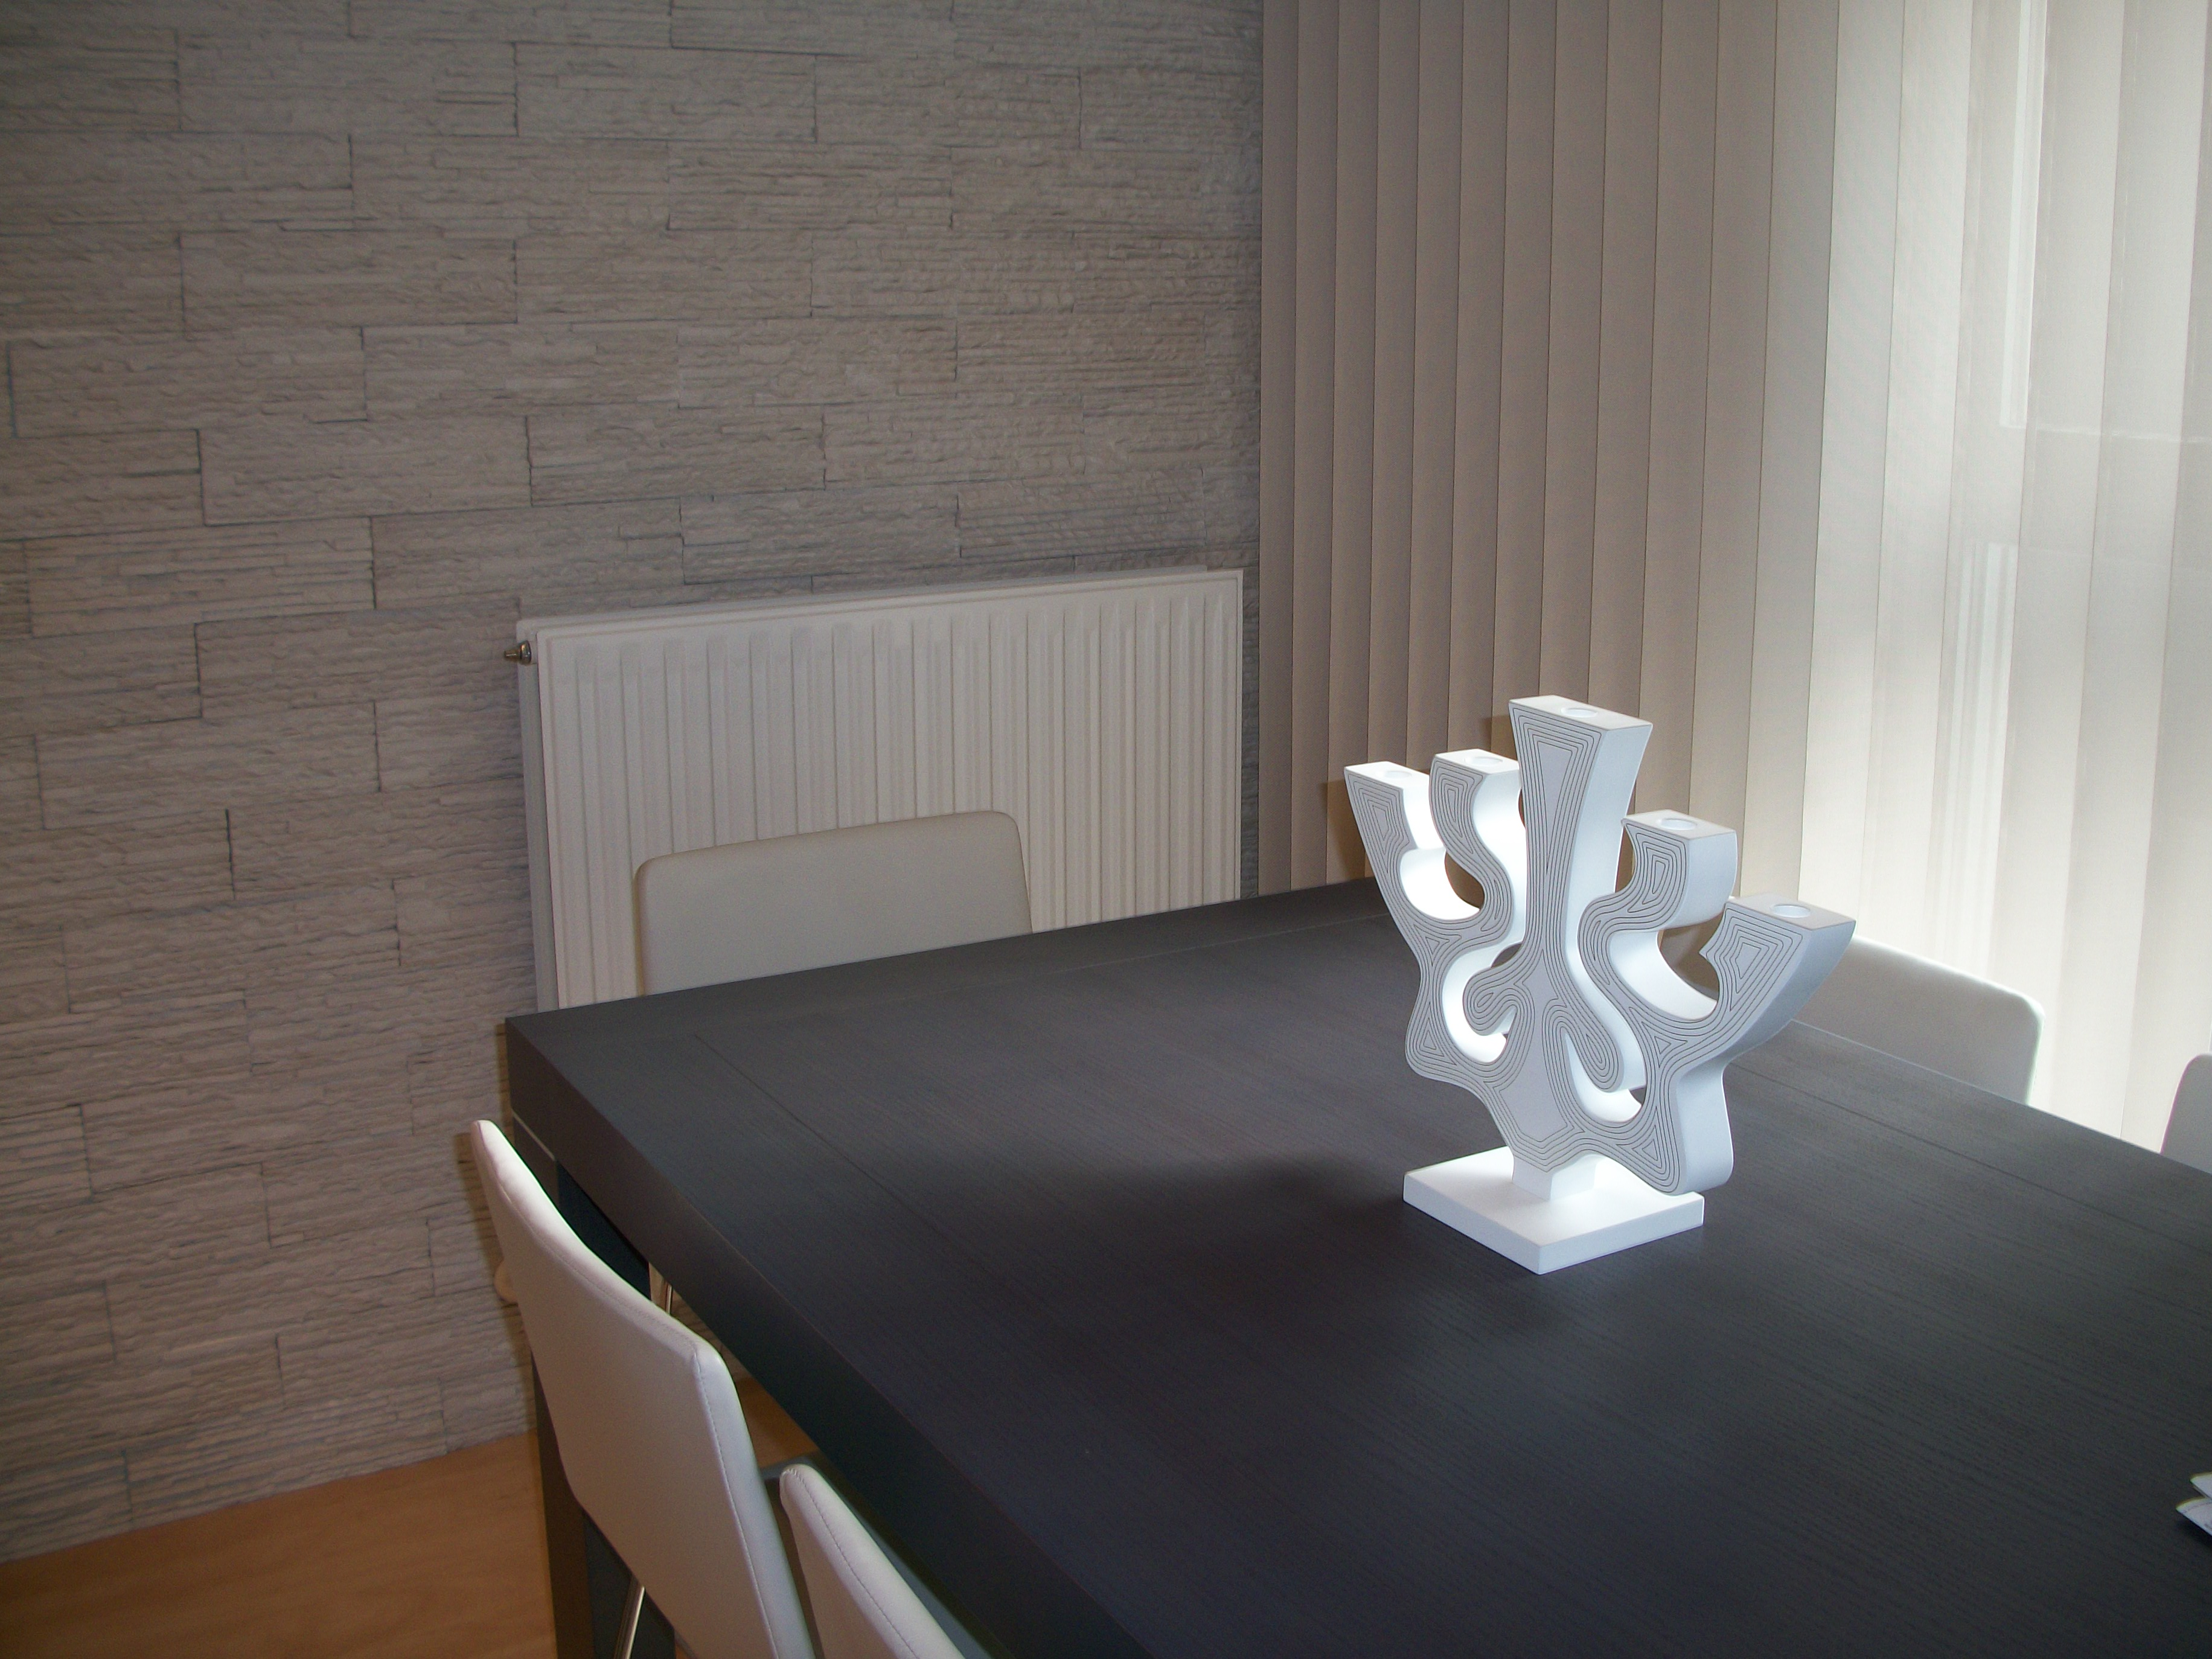 Ecolor, técnicas de decoración